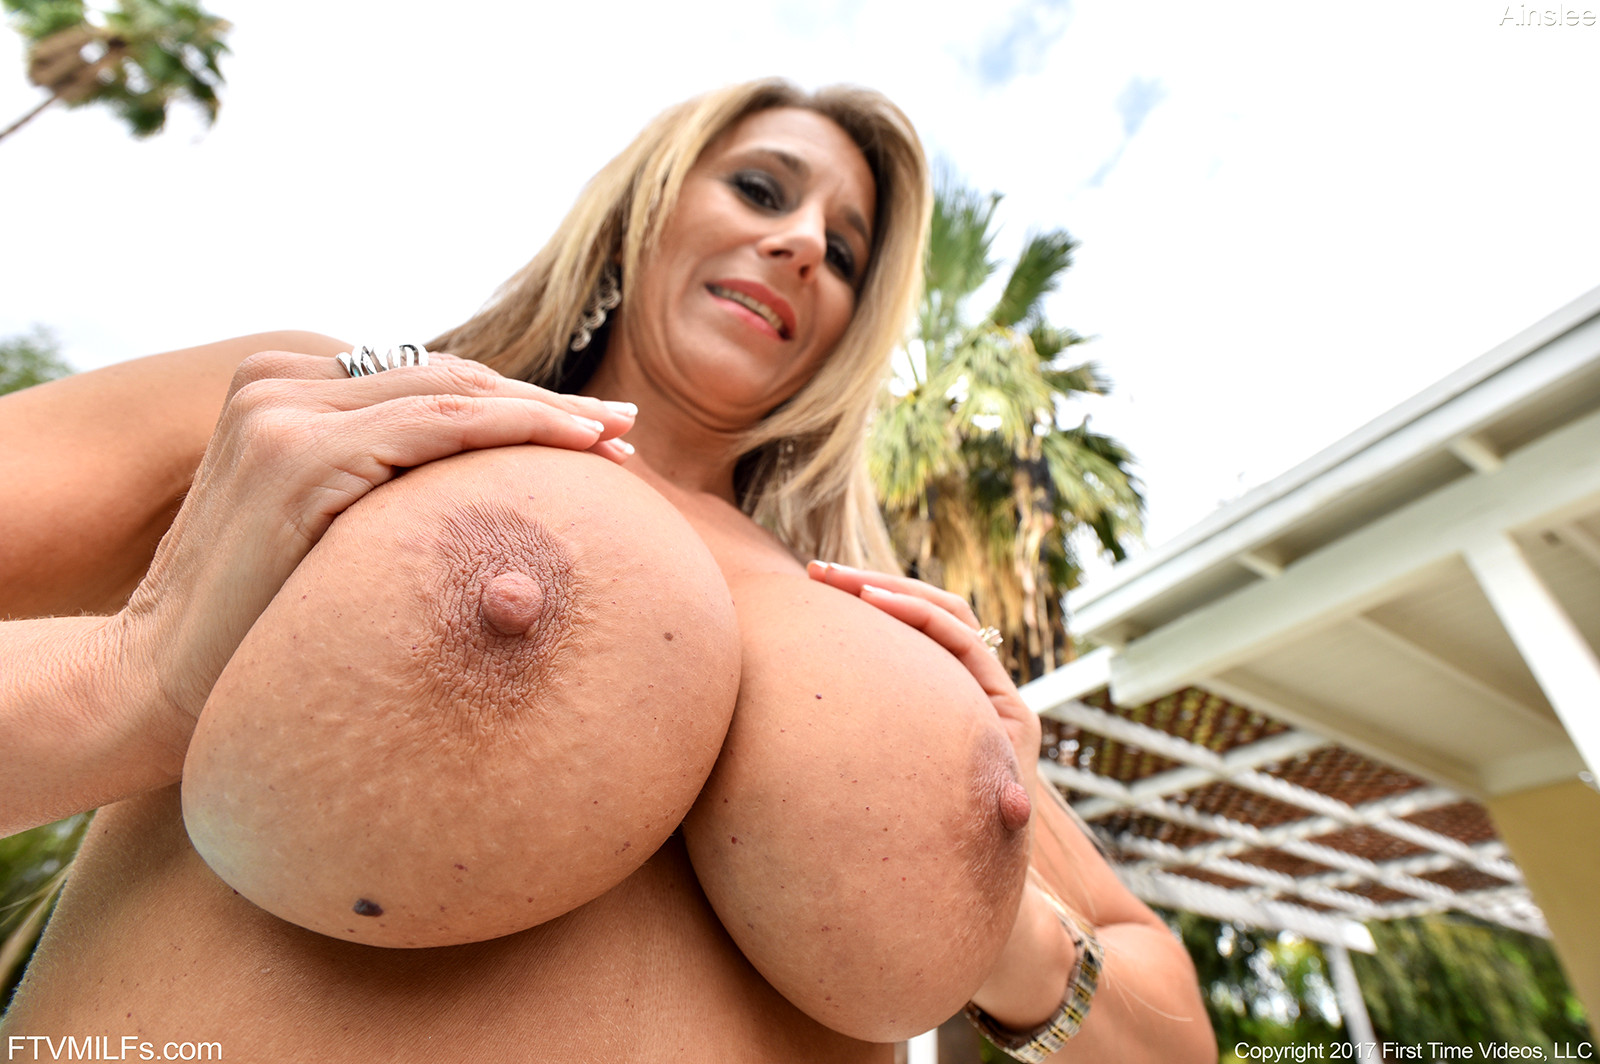 Babe Today Ftv Milfs Ainslee Secret Mature Bravotube Porn Pics-7929